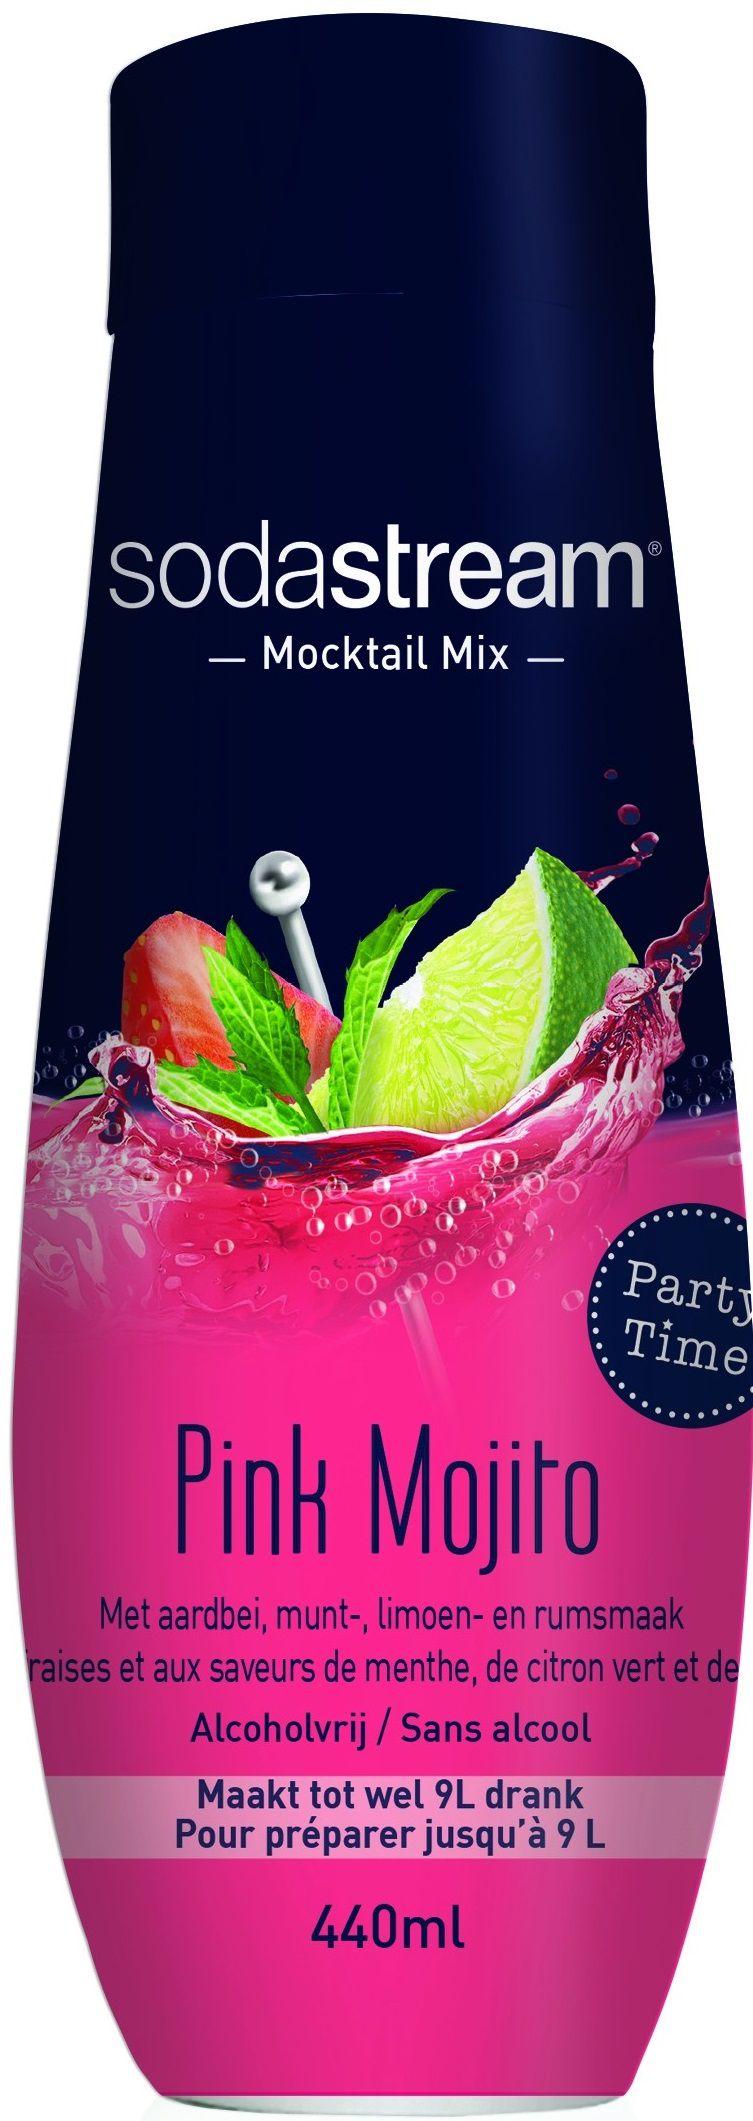 Sodastream Siroop Pink Mojito 440 ml